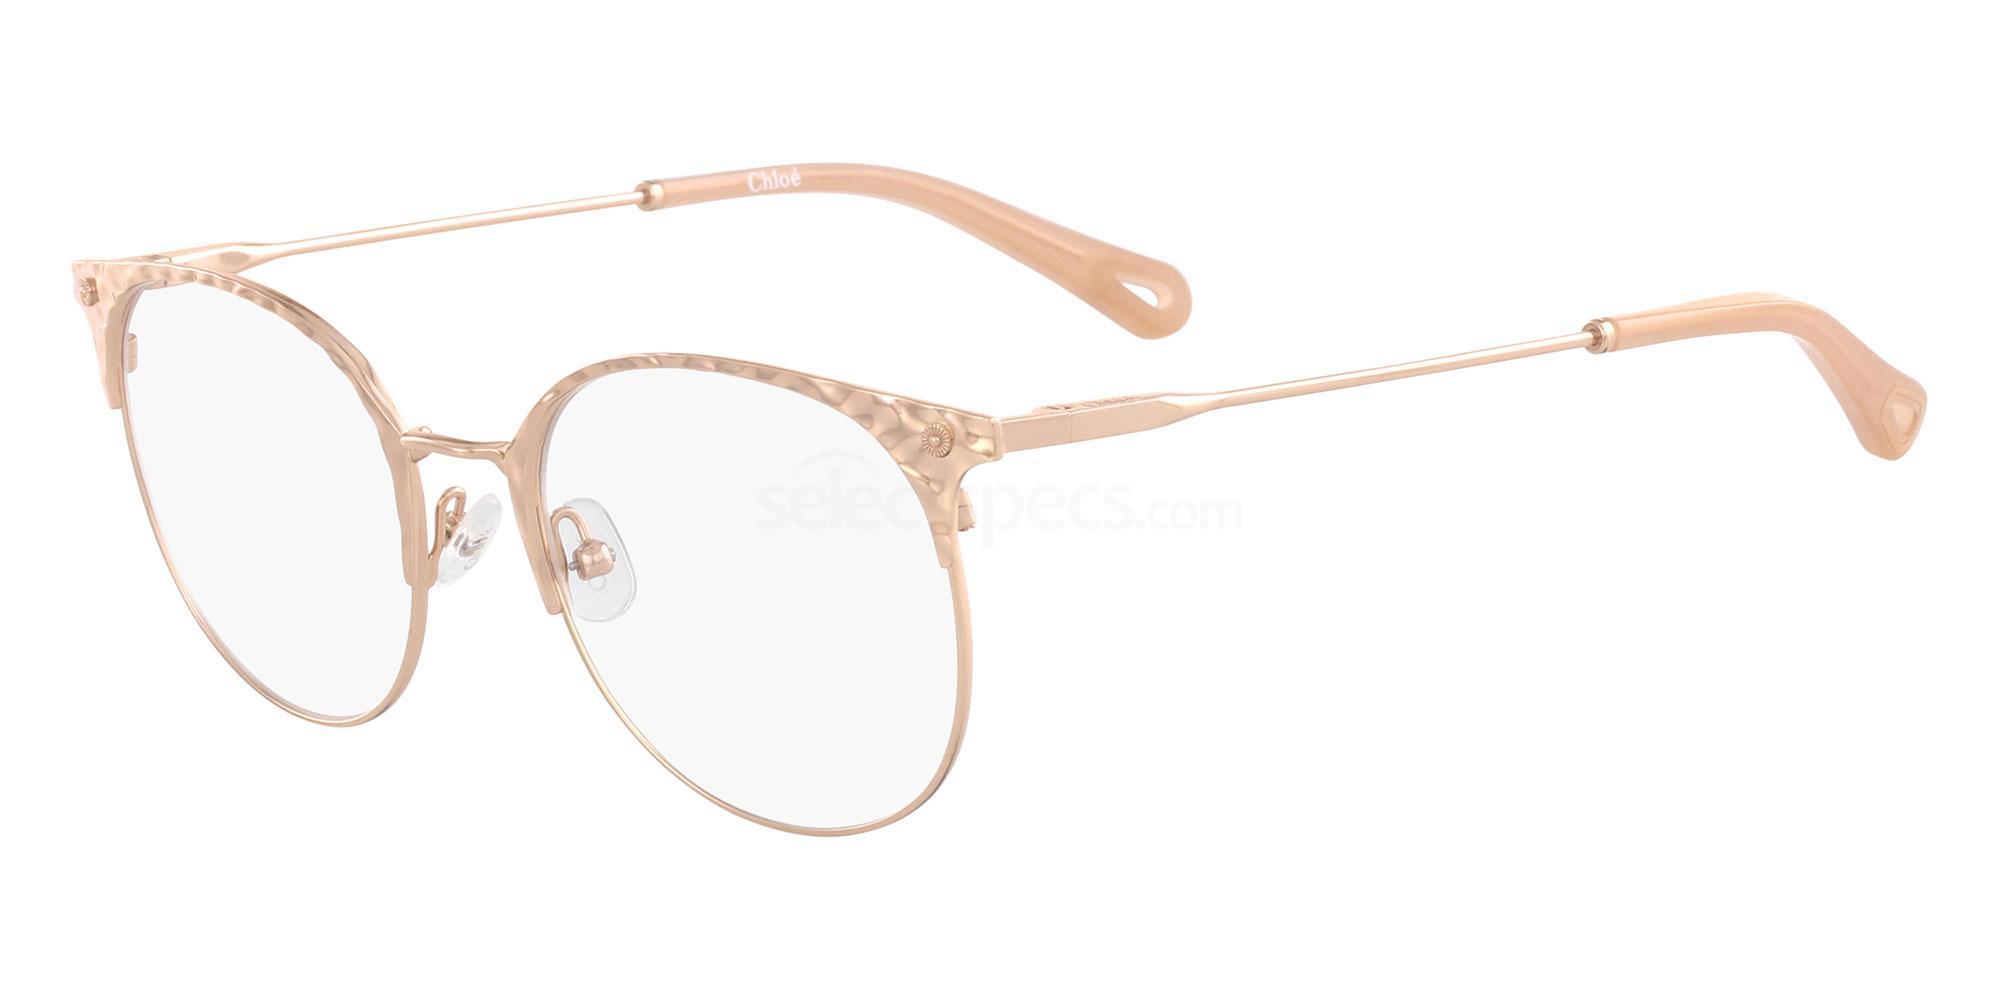 705 CE2141 Glasses, Chloe